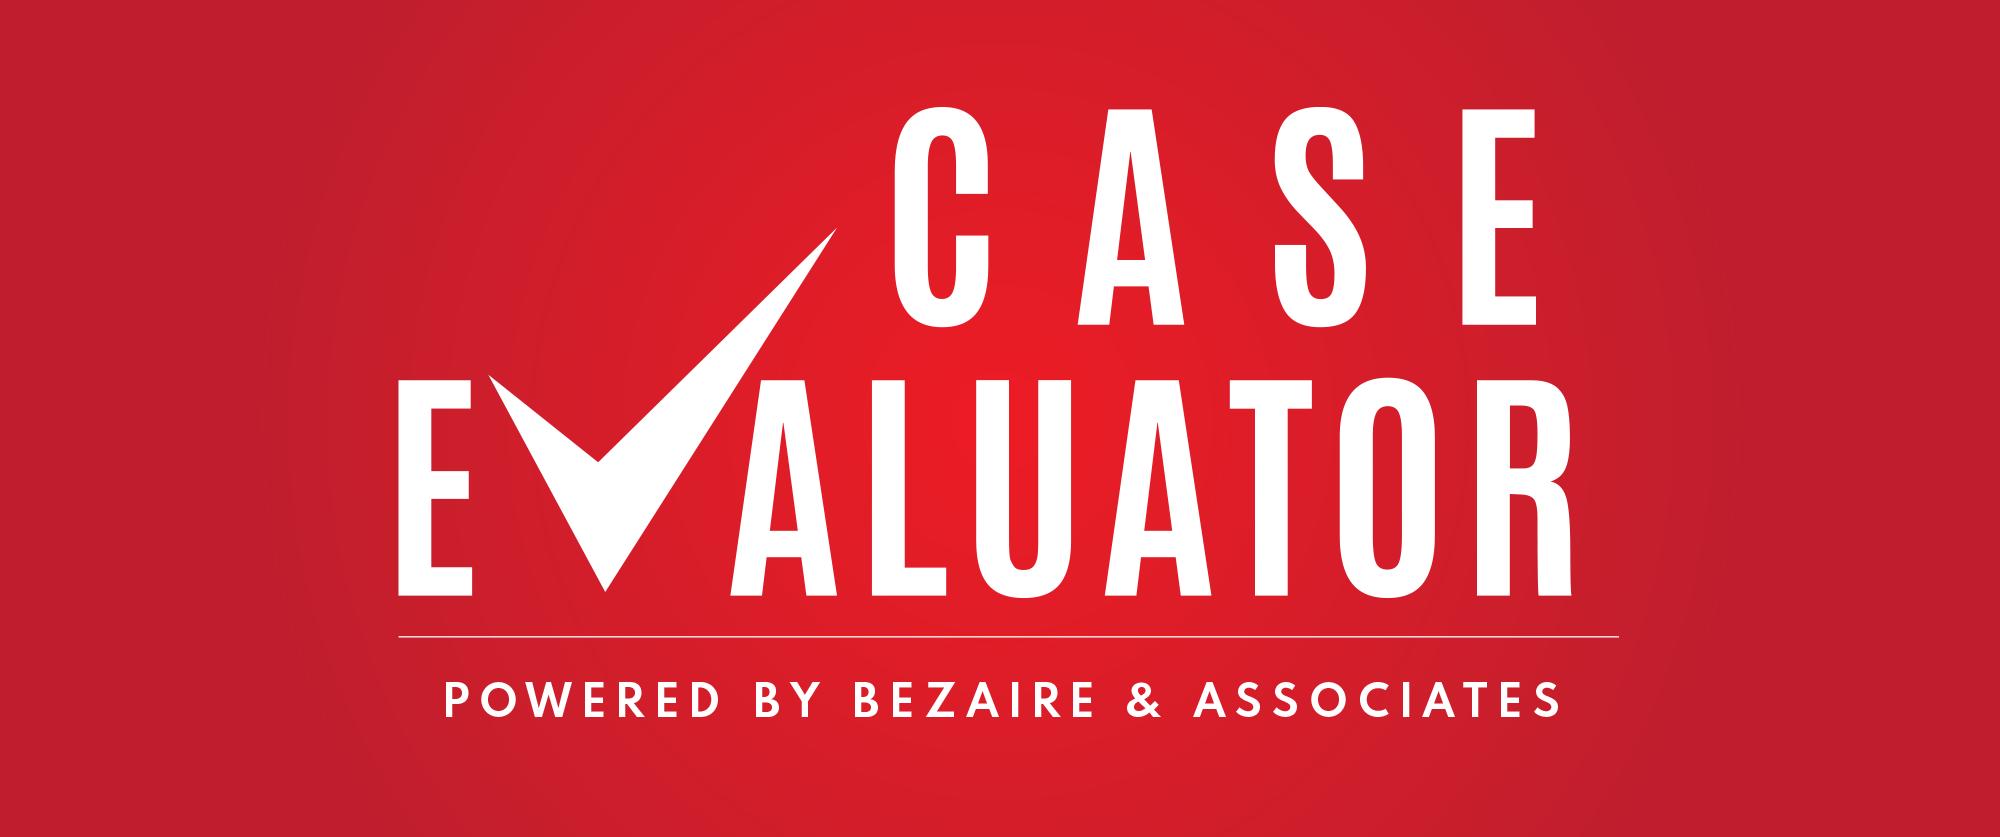 Case Evaluator